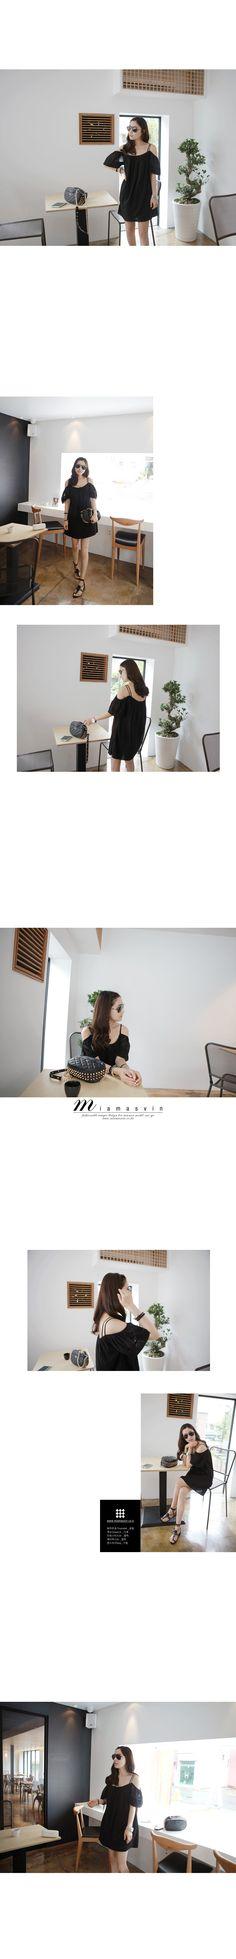 Korean Fashion, Korean Clothing / Black Dress : )  By Miamasvin / #Miamasvin, #Stylenanda, #dholic